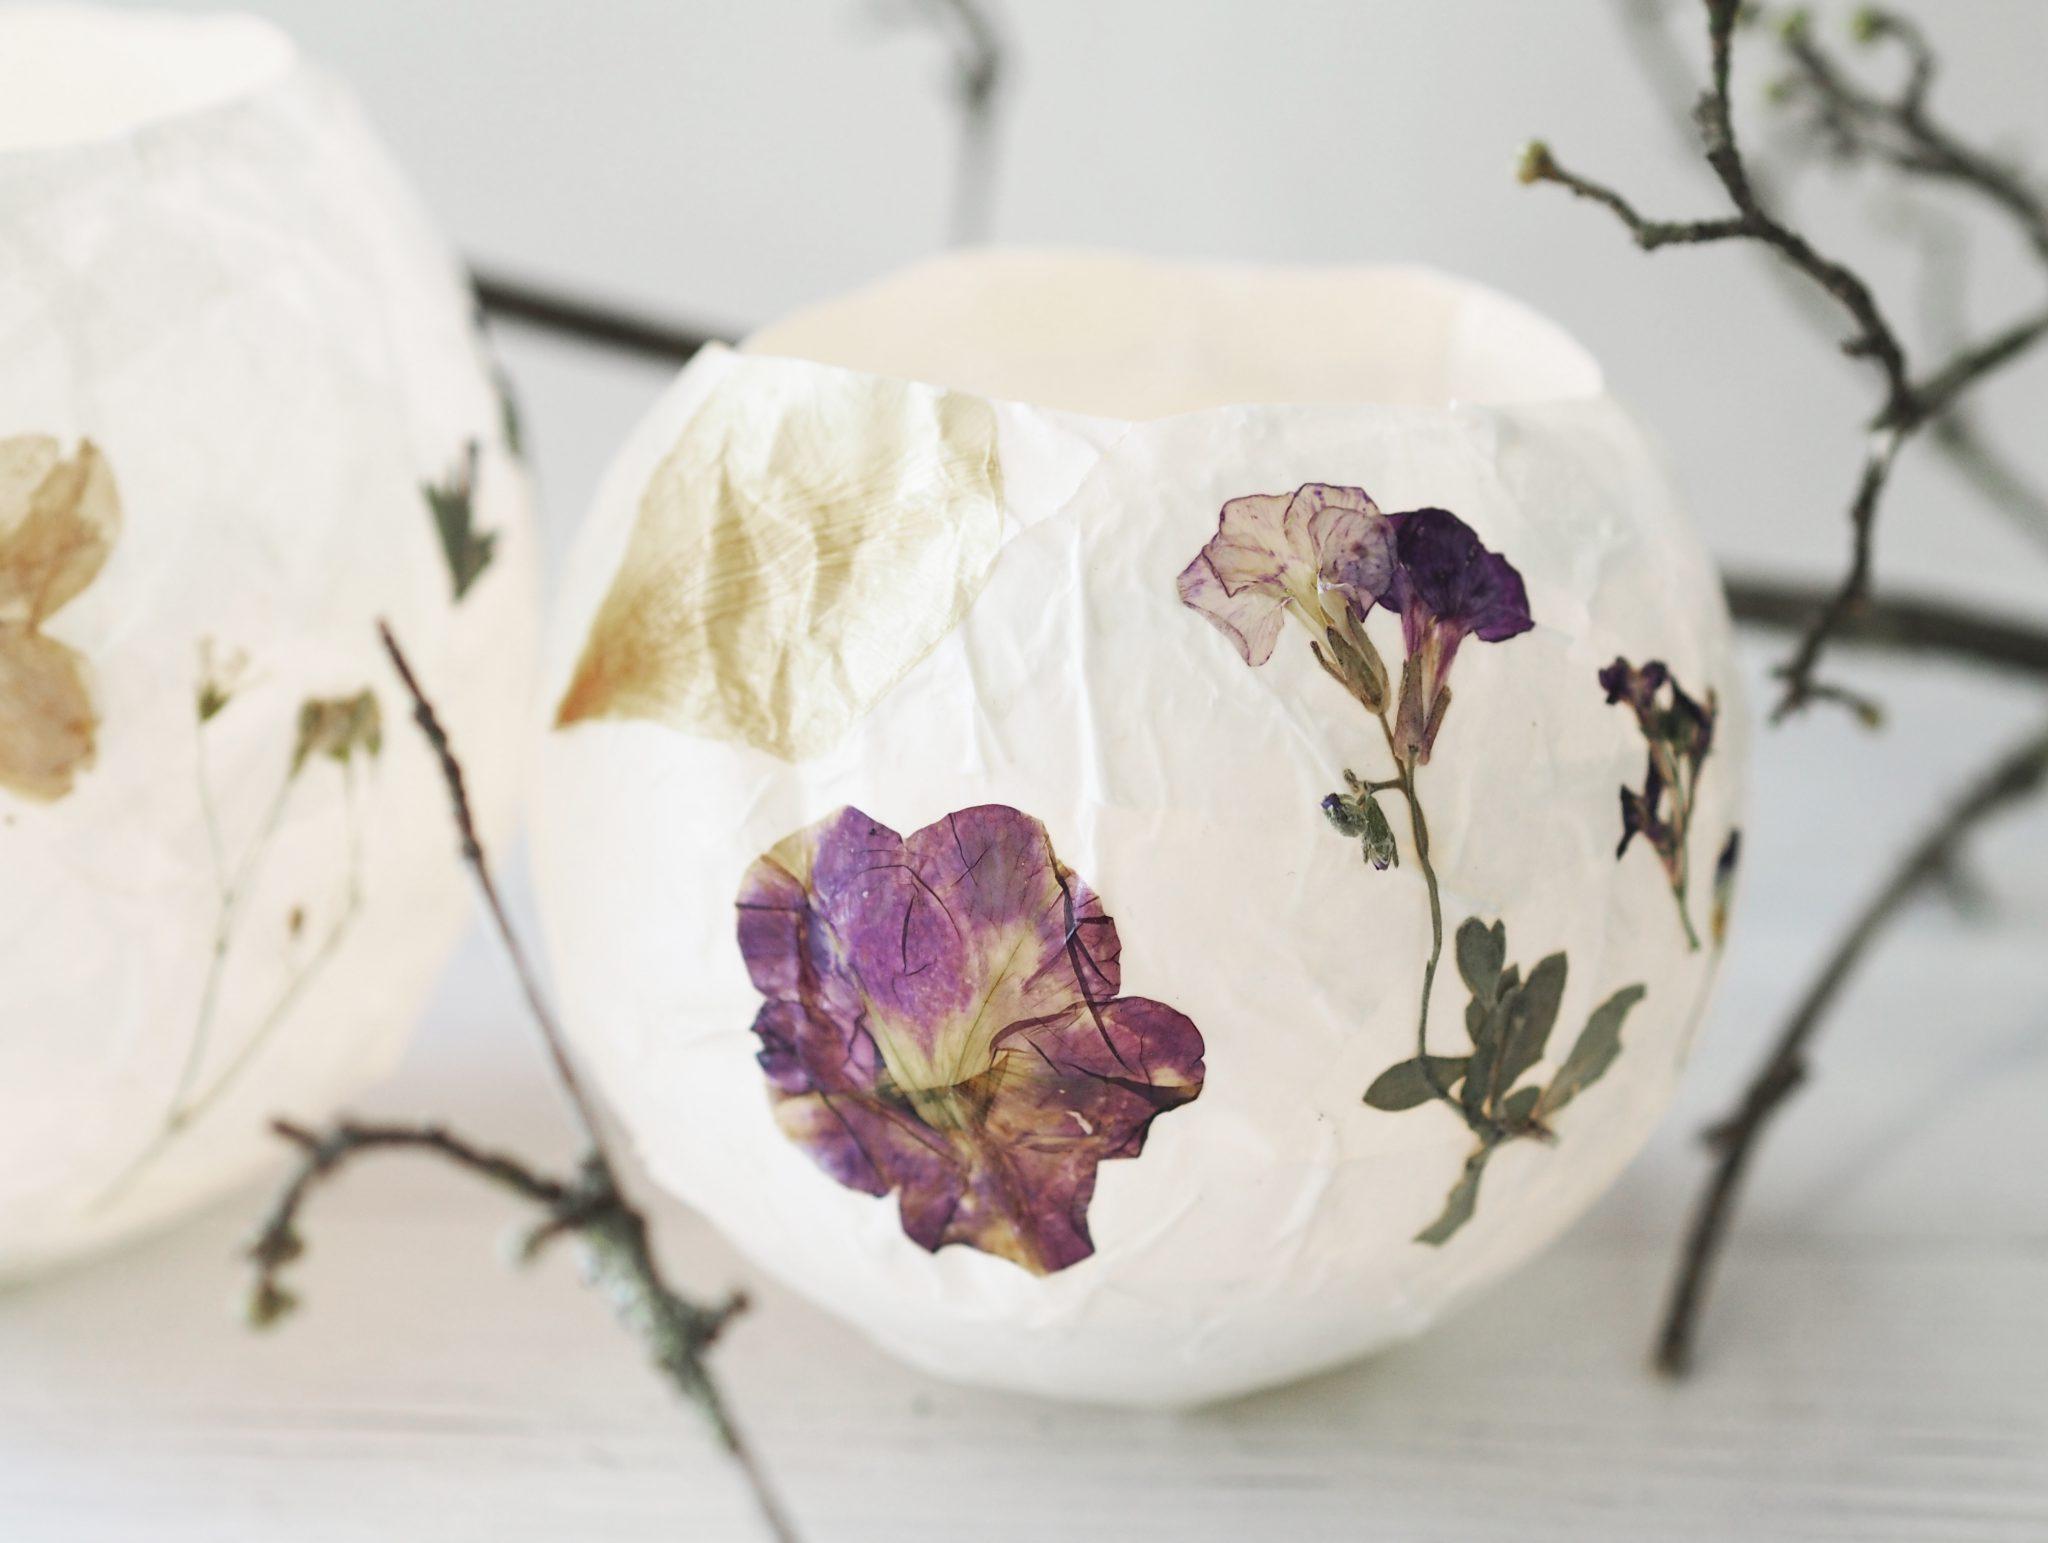 P6250277 - Selbstgemachte Lampions mit getrockneten Blüten